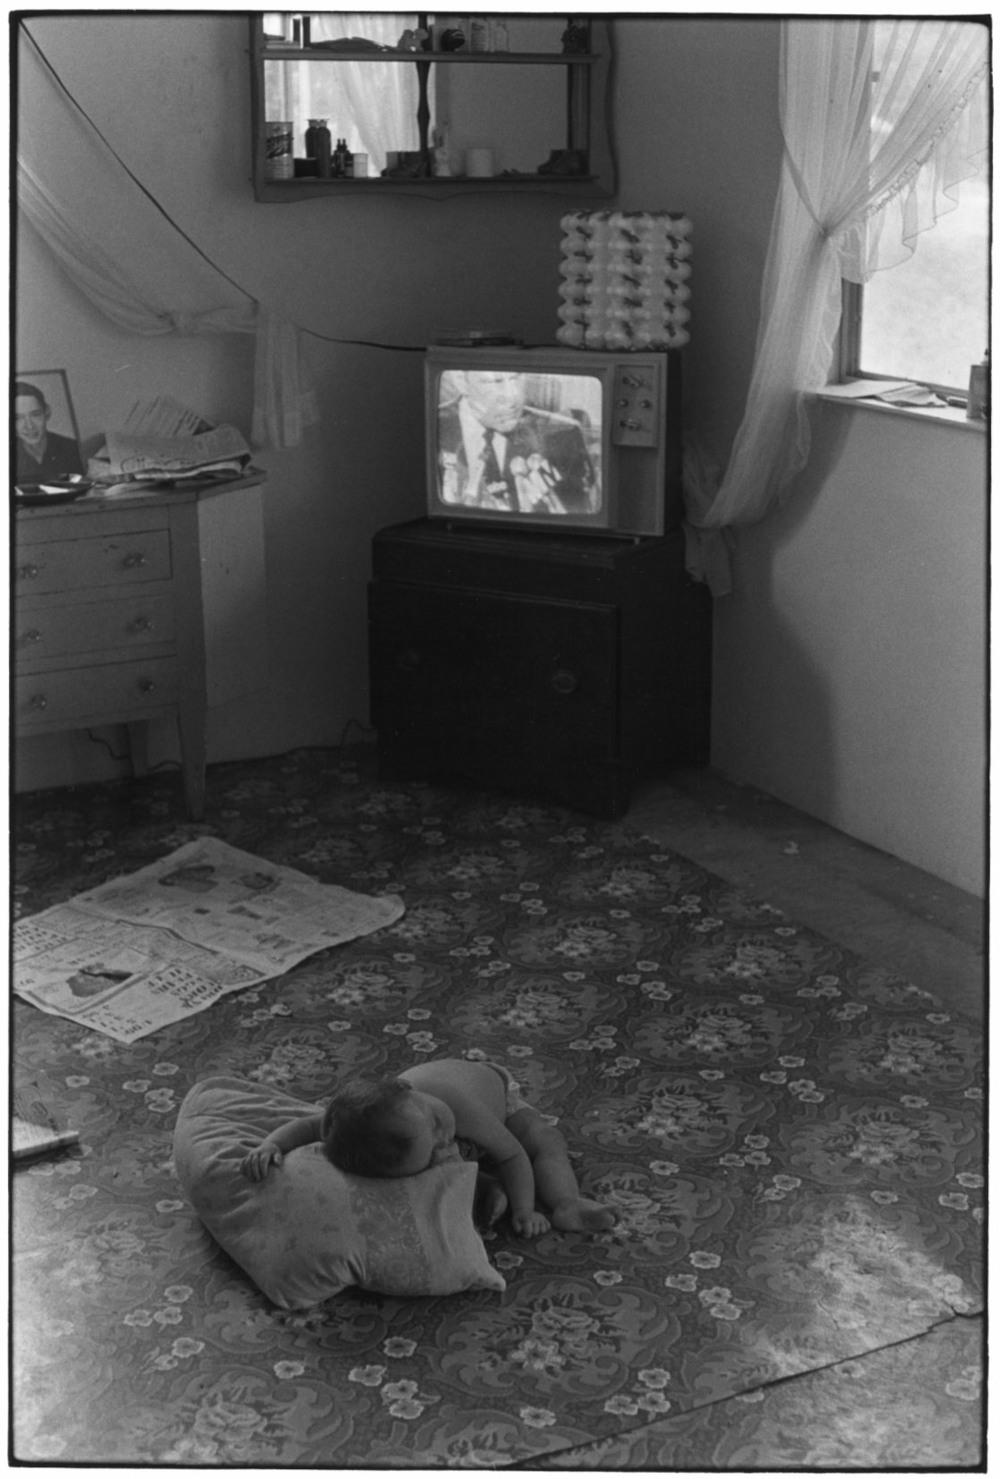 Baby lying on floor, Nixon on TV, 1972.©Duke University David M. Rubenstein Rare Book & Manuscript Library